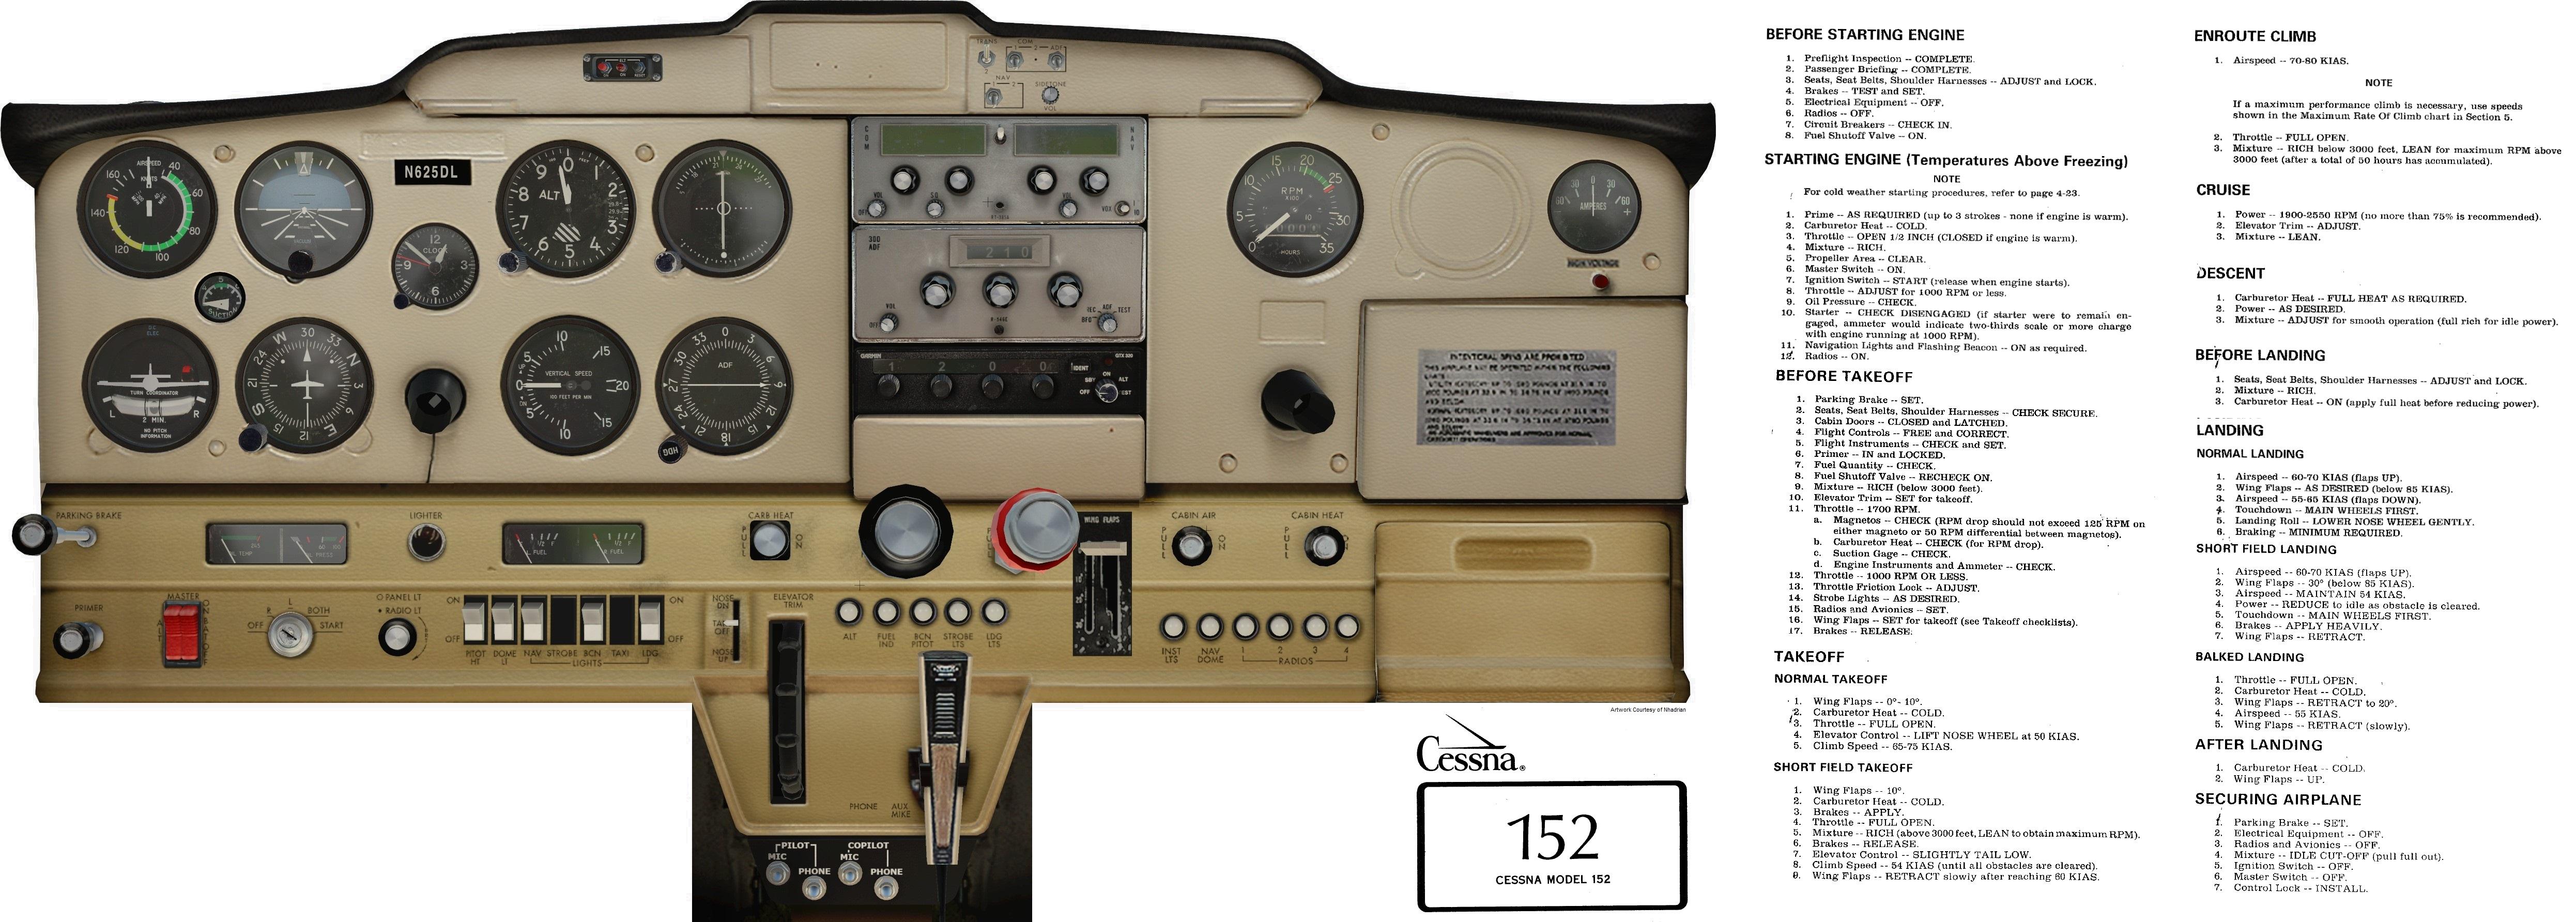 good c152 cockpit poster